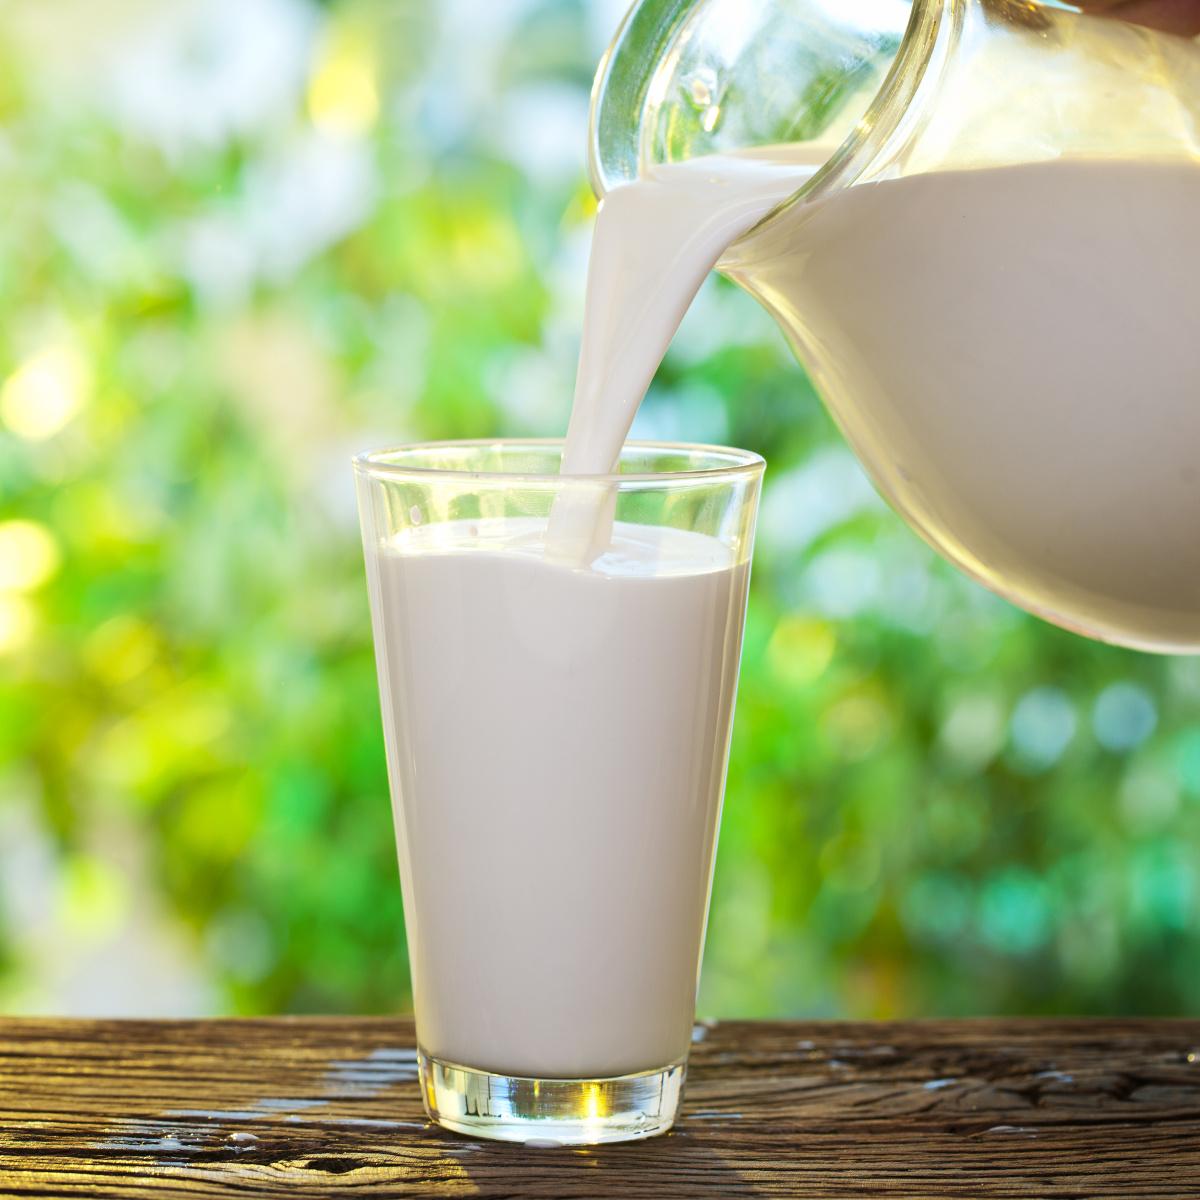 Intolerância à lactose ou APLV: Entenda a diferença